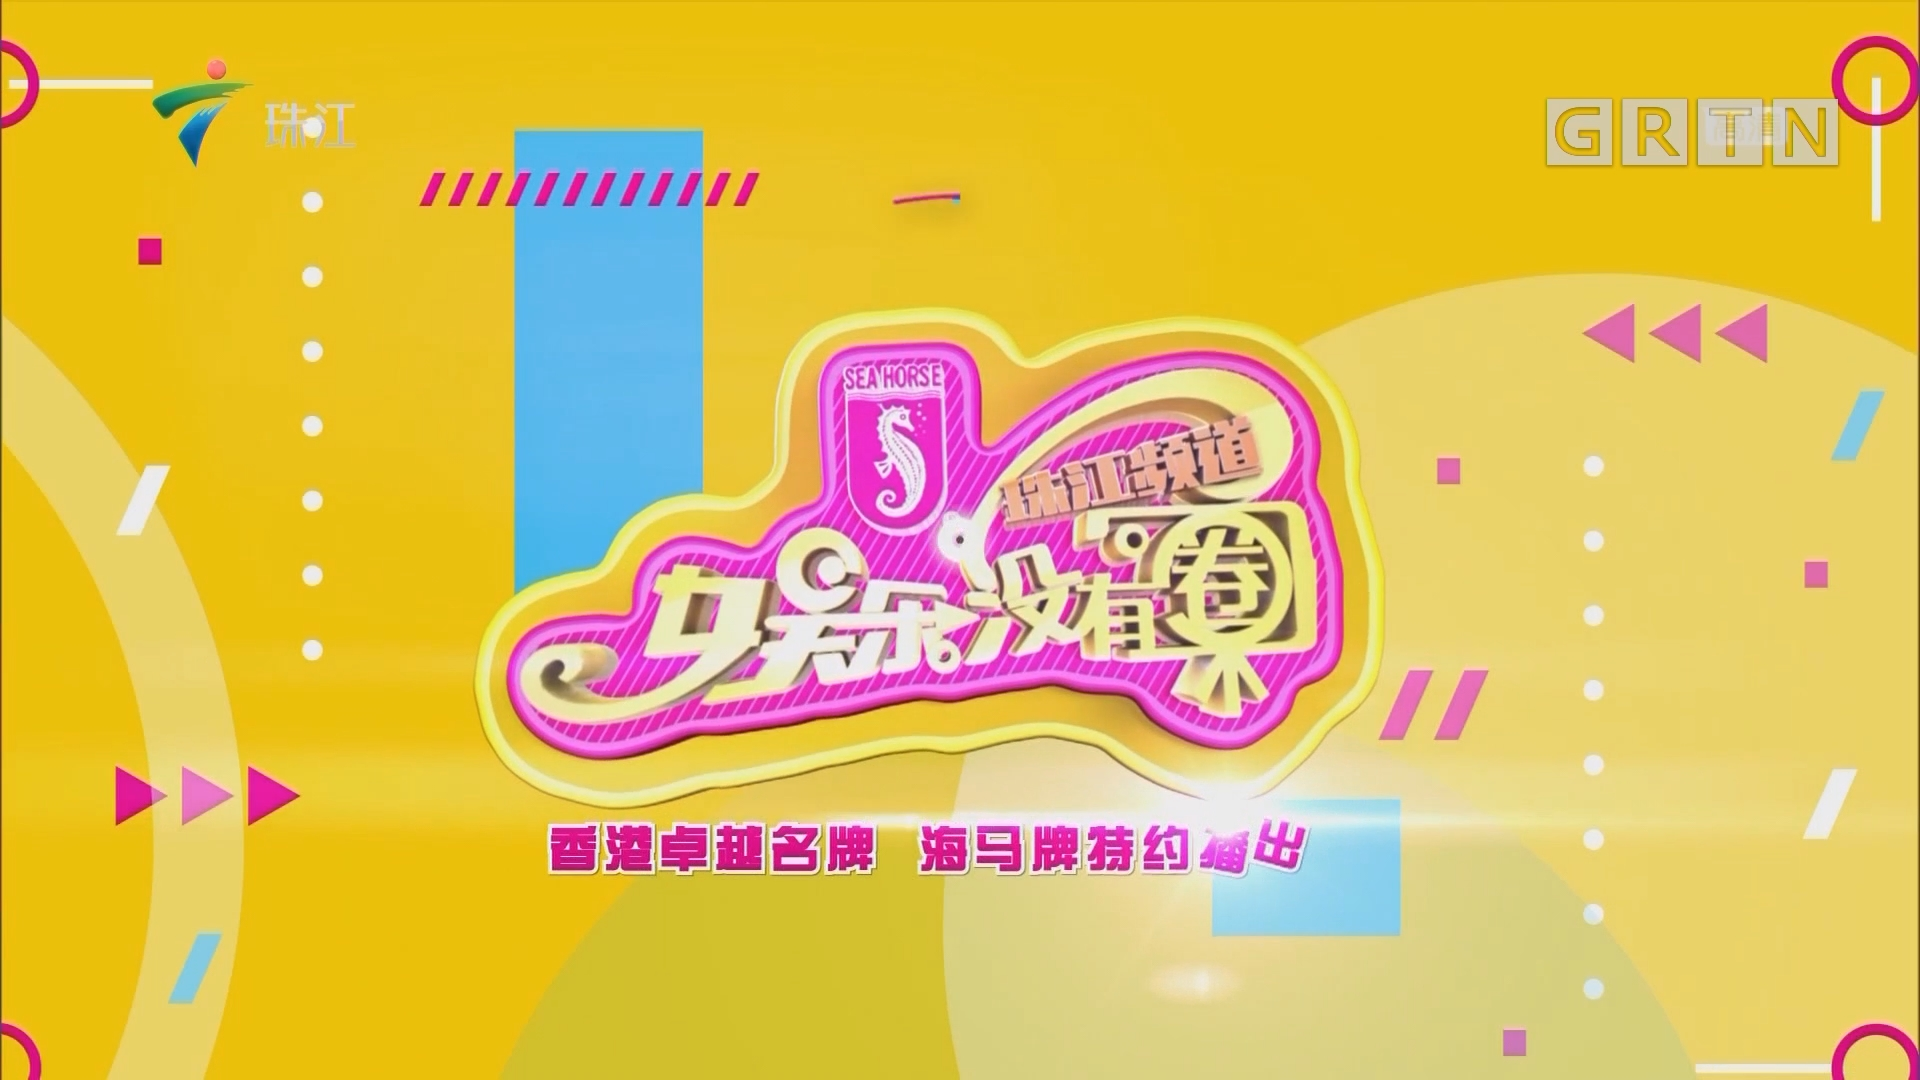 [HD][2019-07-21]娱乐没有圈:2019暑期档之国产电影:刘德华 邓超 艾伦 谁能笑到最后?